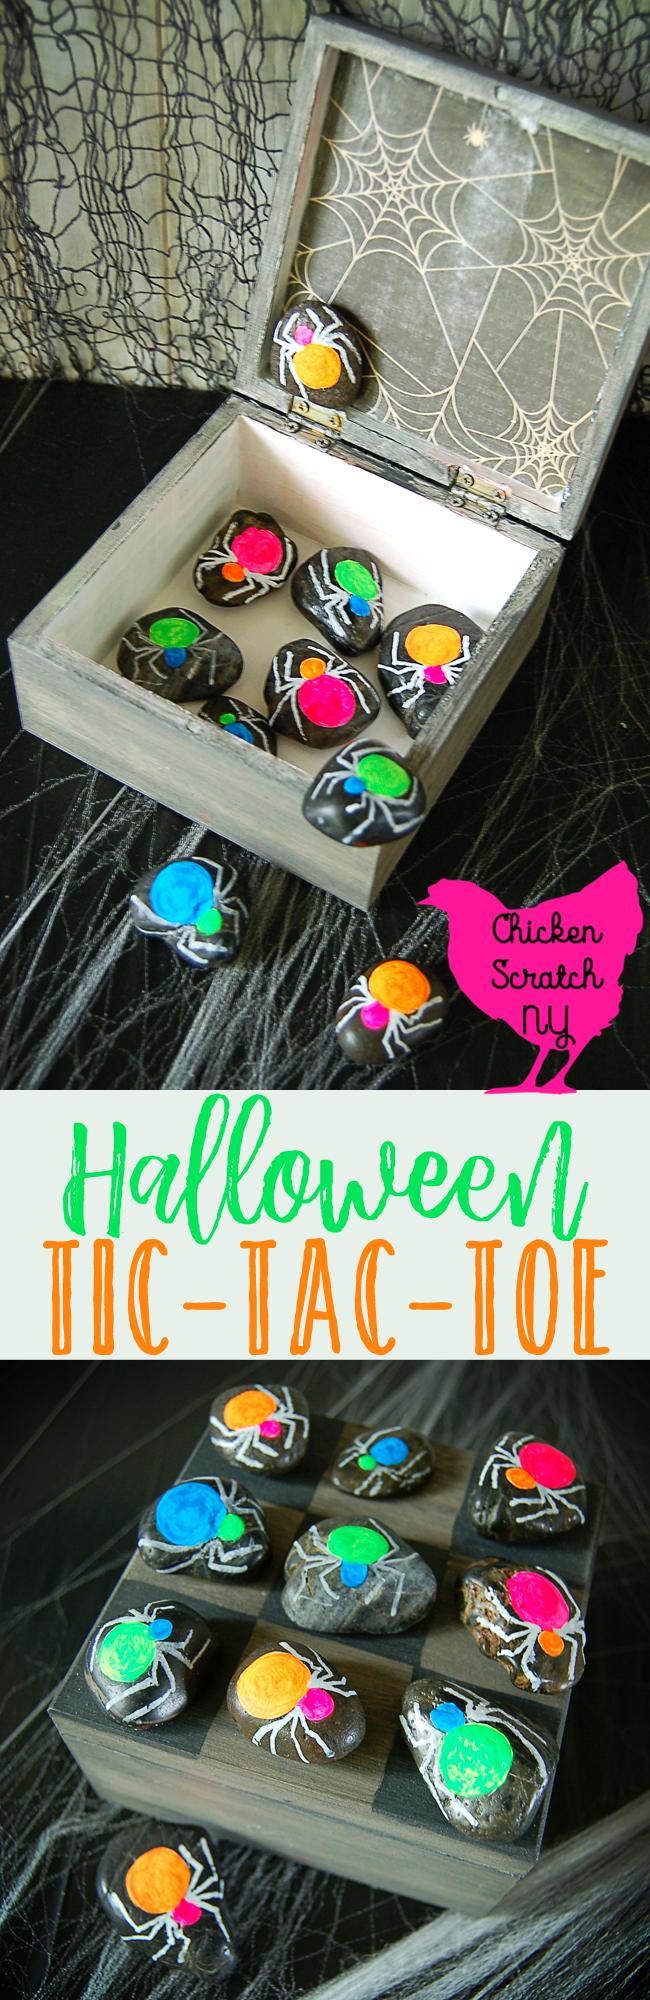 Halloween Tic Tac Toe, Halloween game, Halloween Kids, Halloween DIY, Halloween Spider